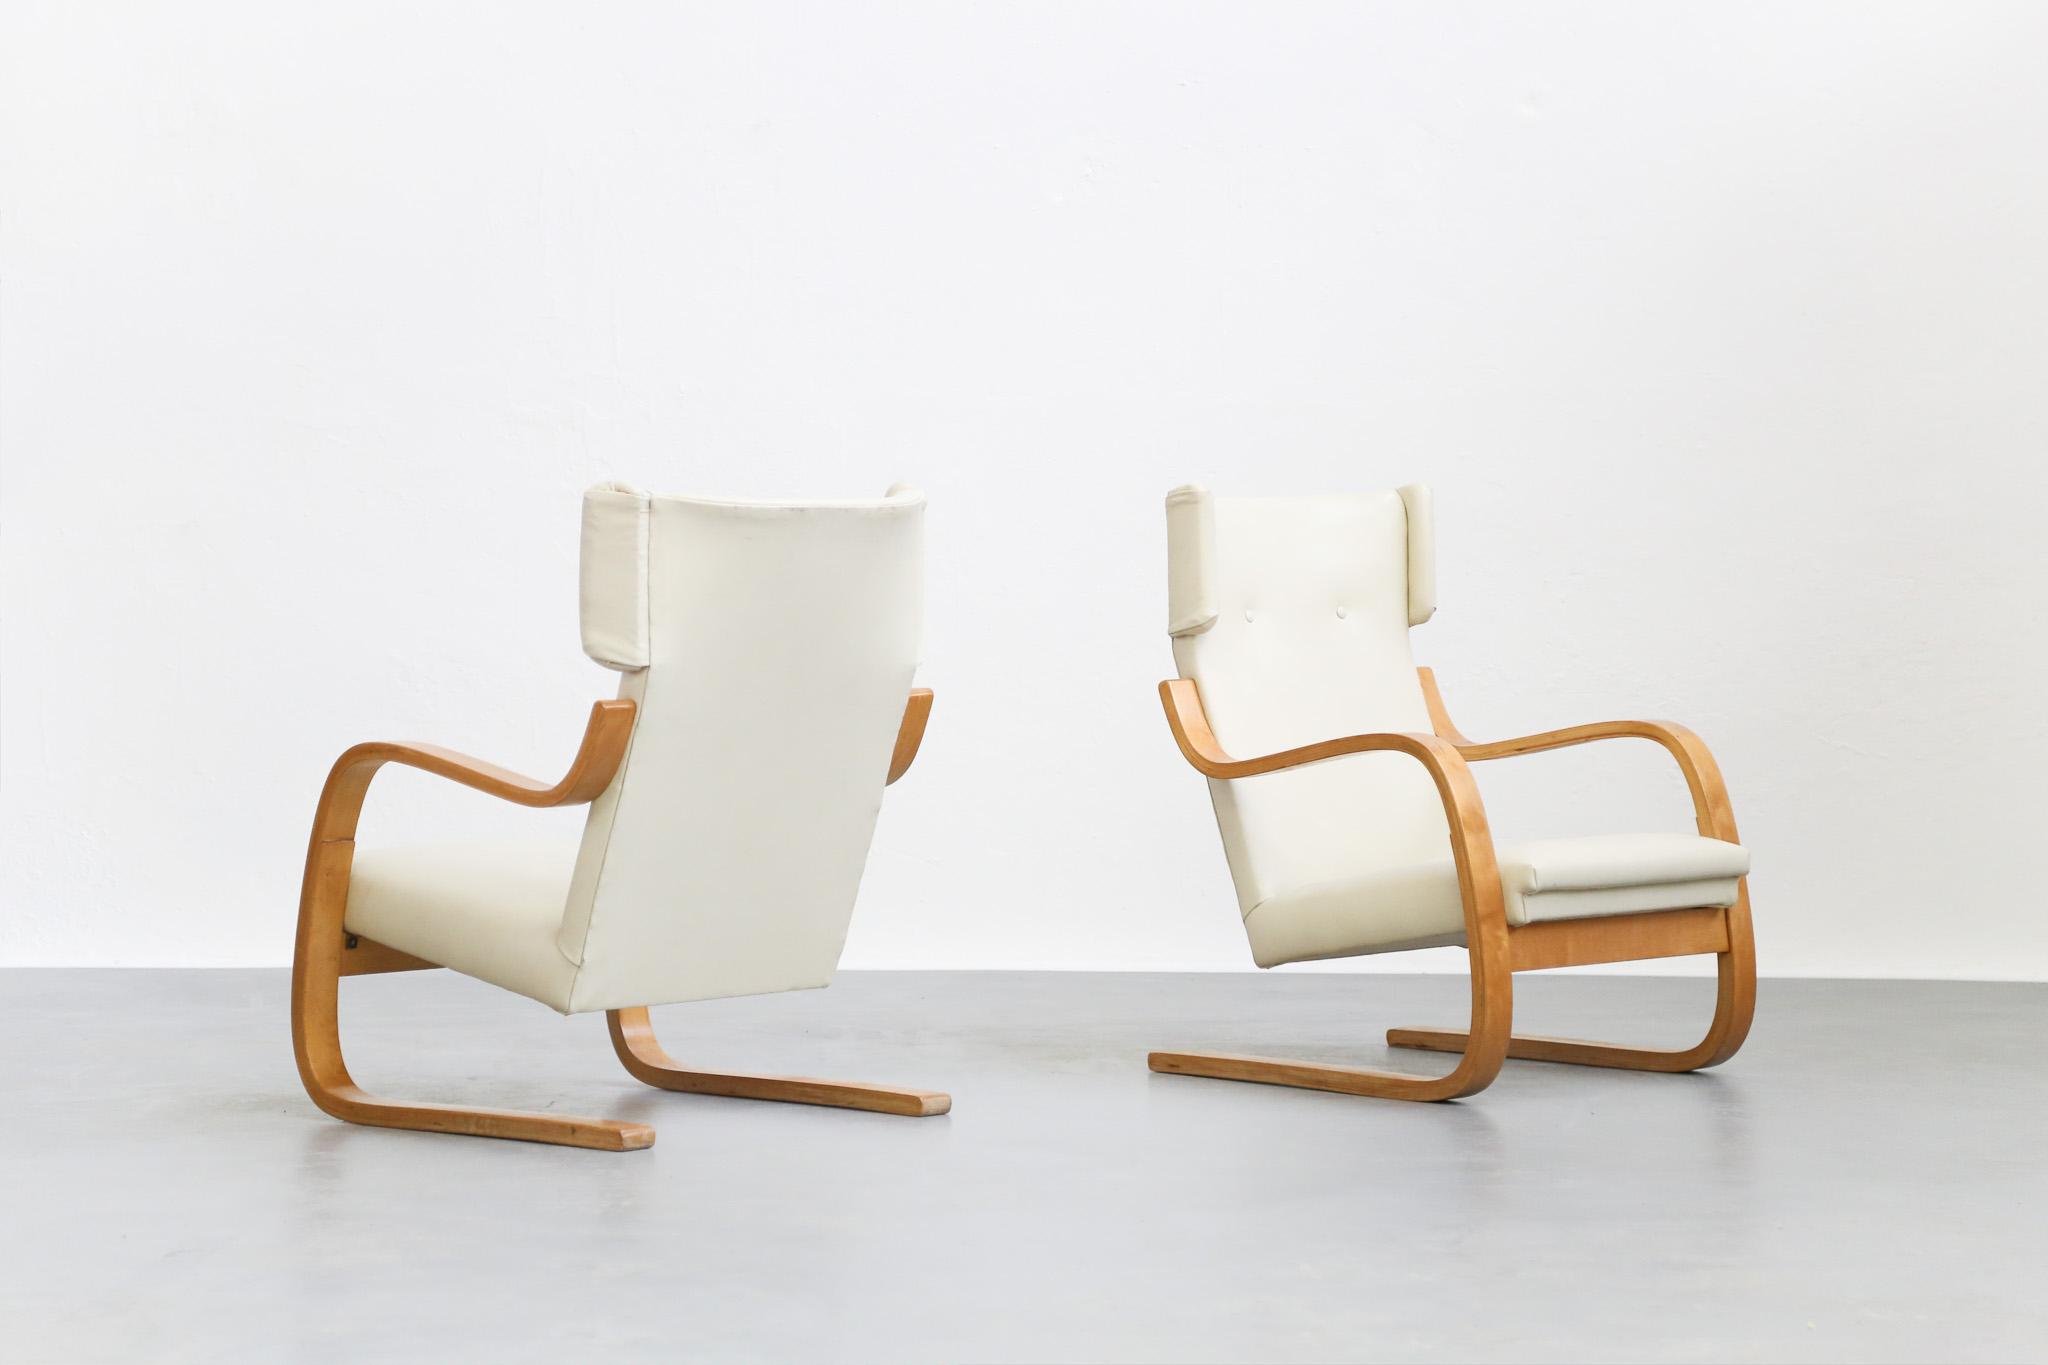 paire de fauteuil alvar aalto 401 danke galerie. Black Bedroom Furniture Sets. Home Design Ideas